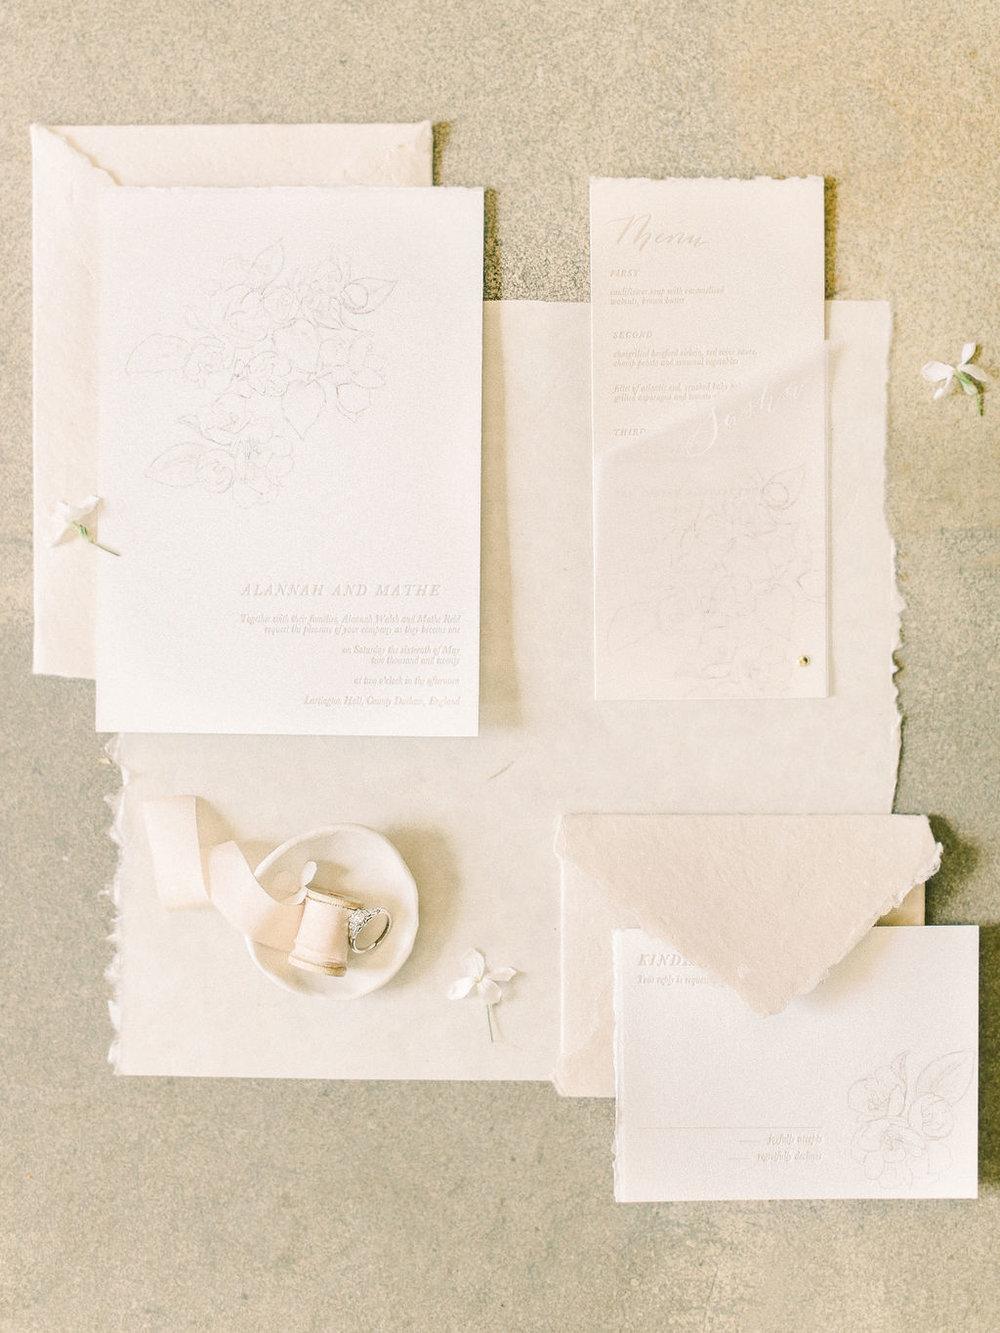 letterpress charcoal botanical illustration vellum wrap handmade paper